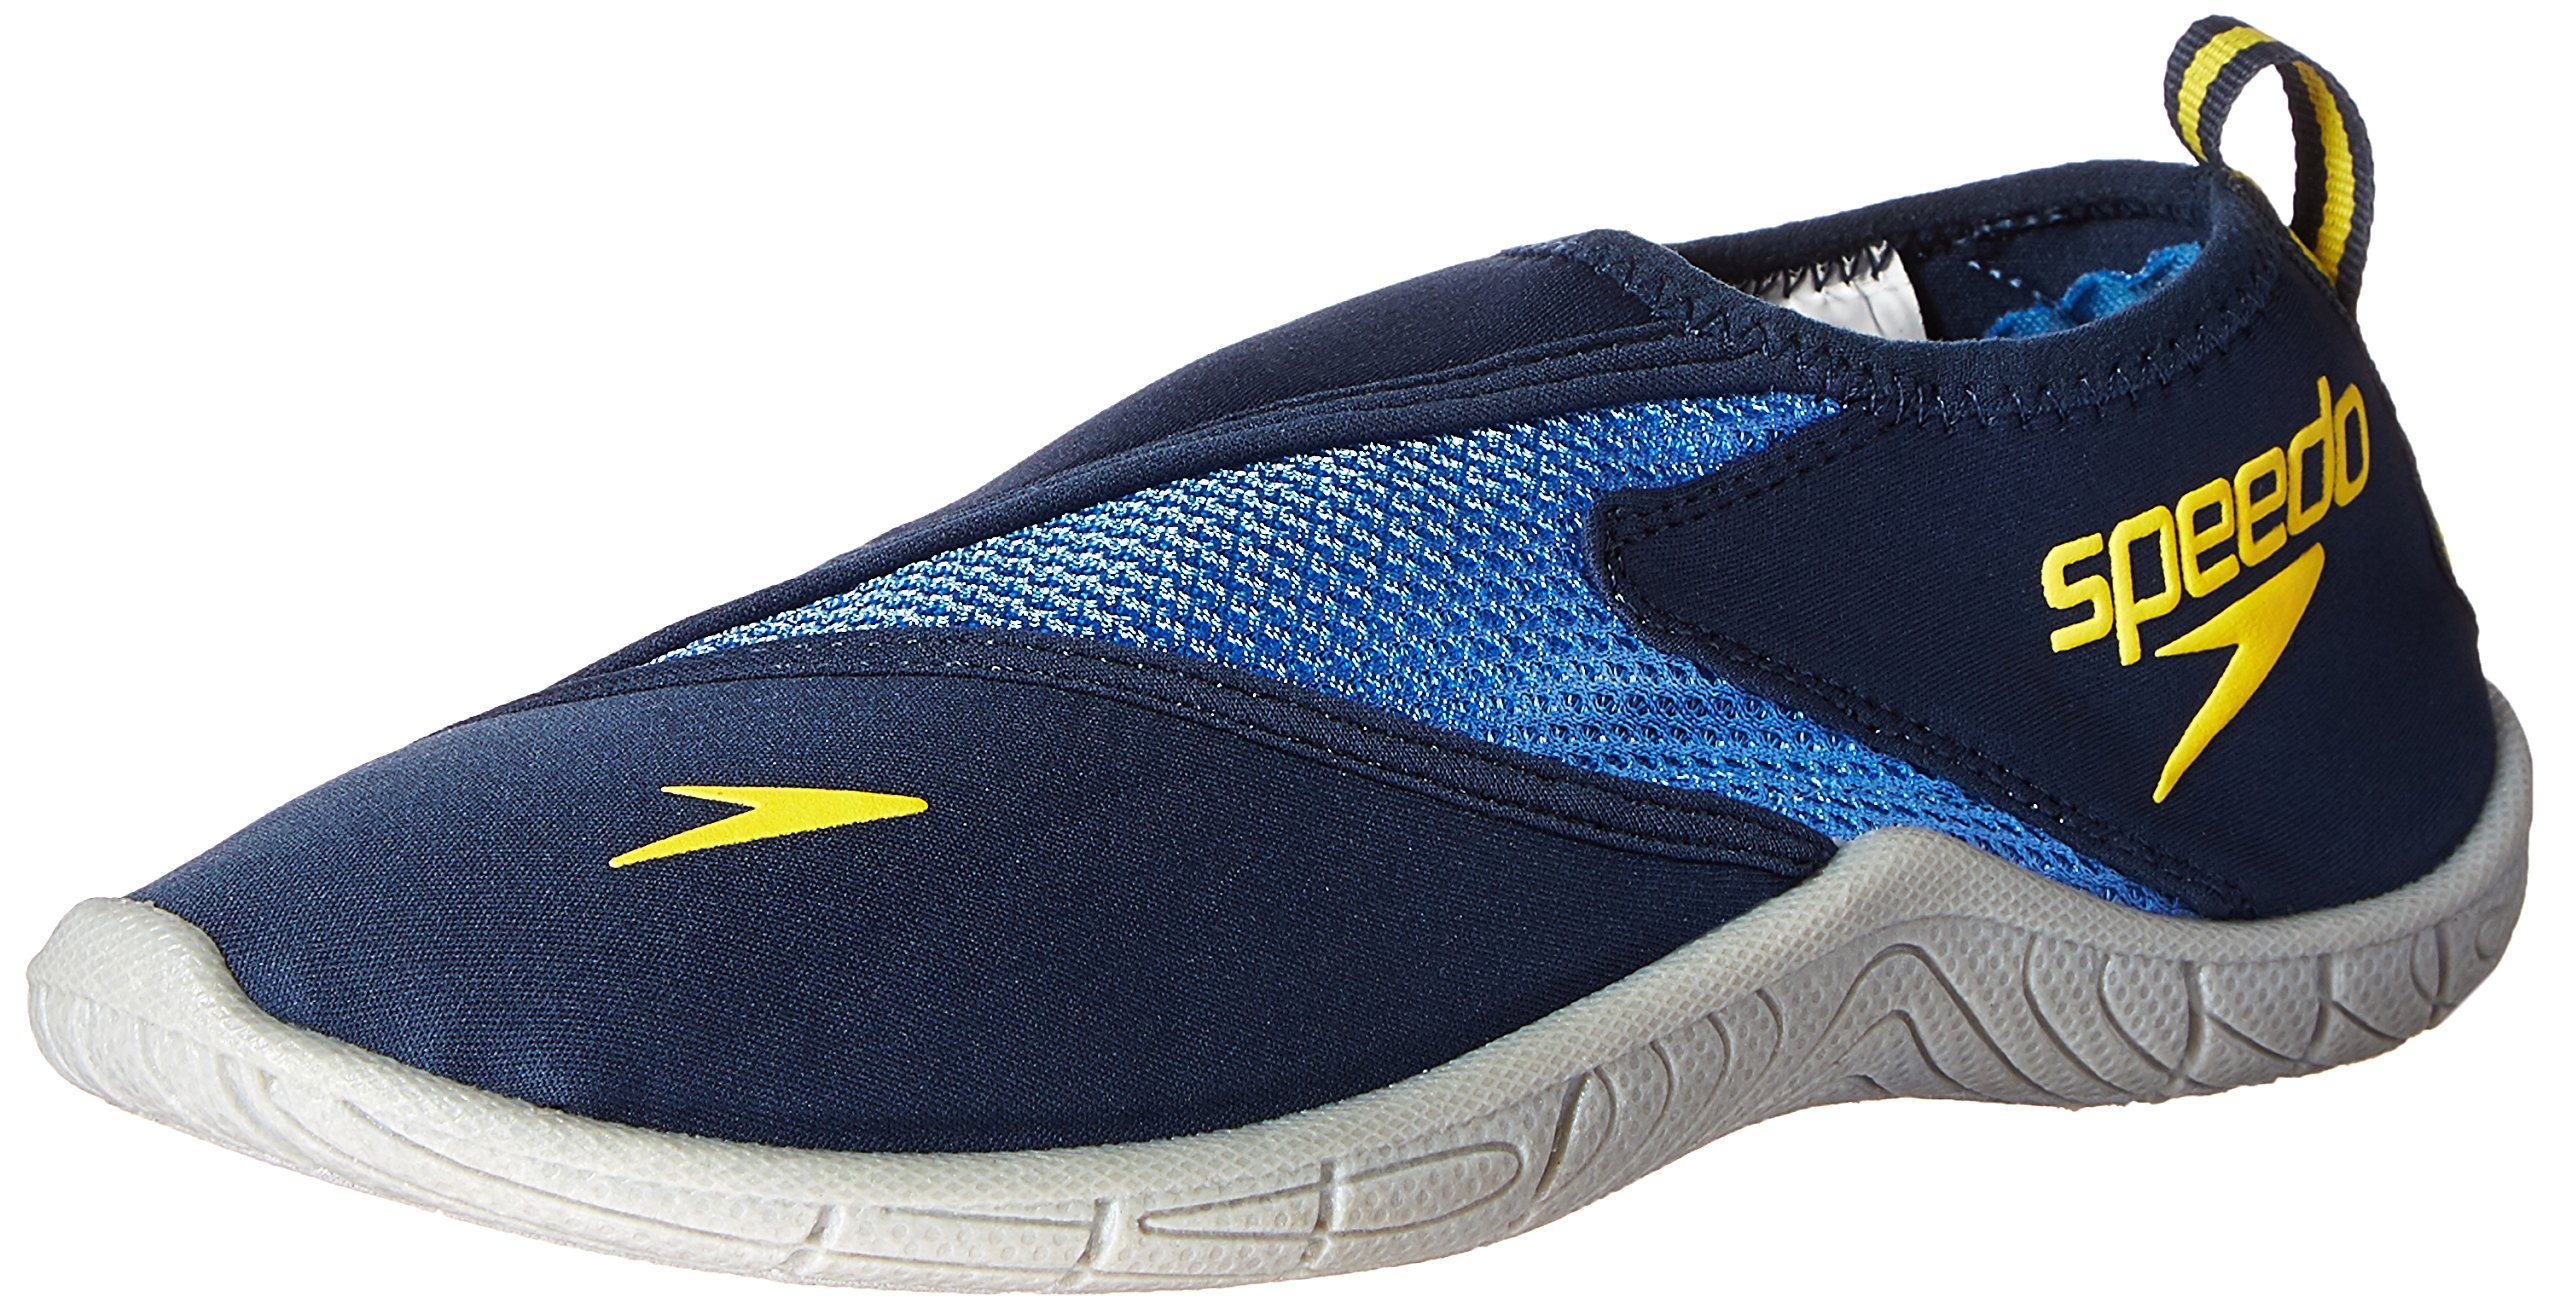 Speedo Women's Surfwalker Pro 3.0 Water Shoe, Navy, 9 by Speedo